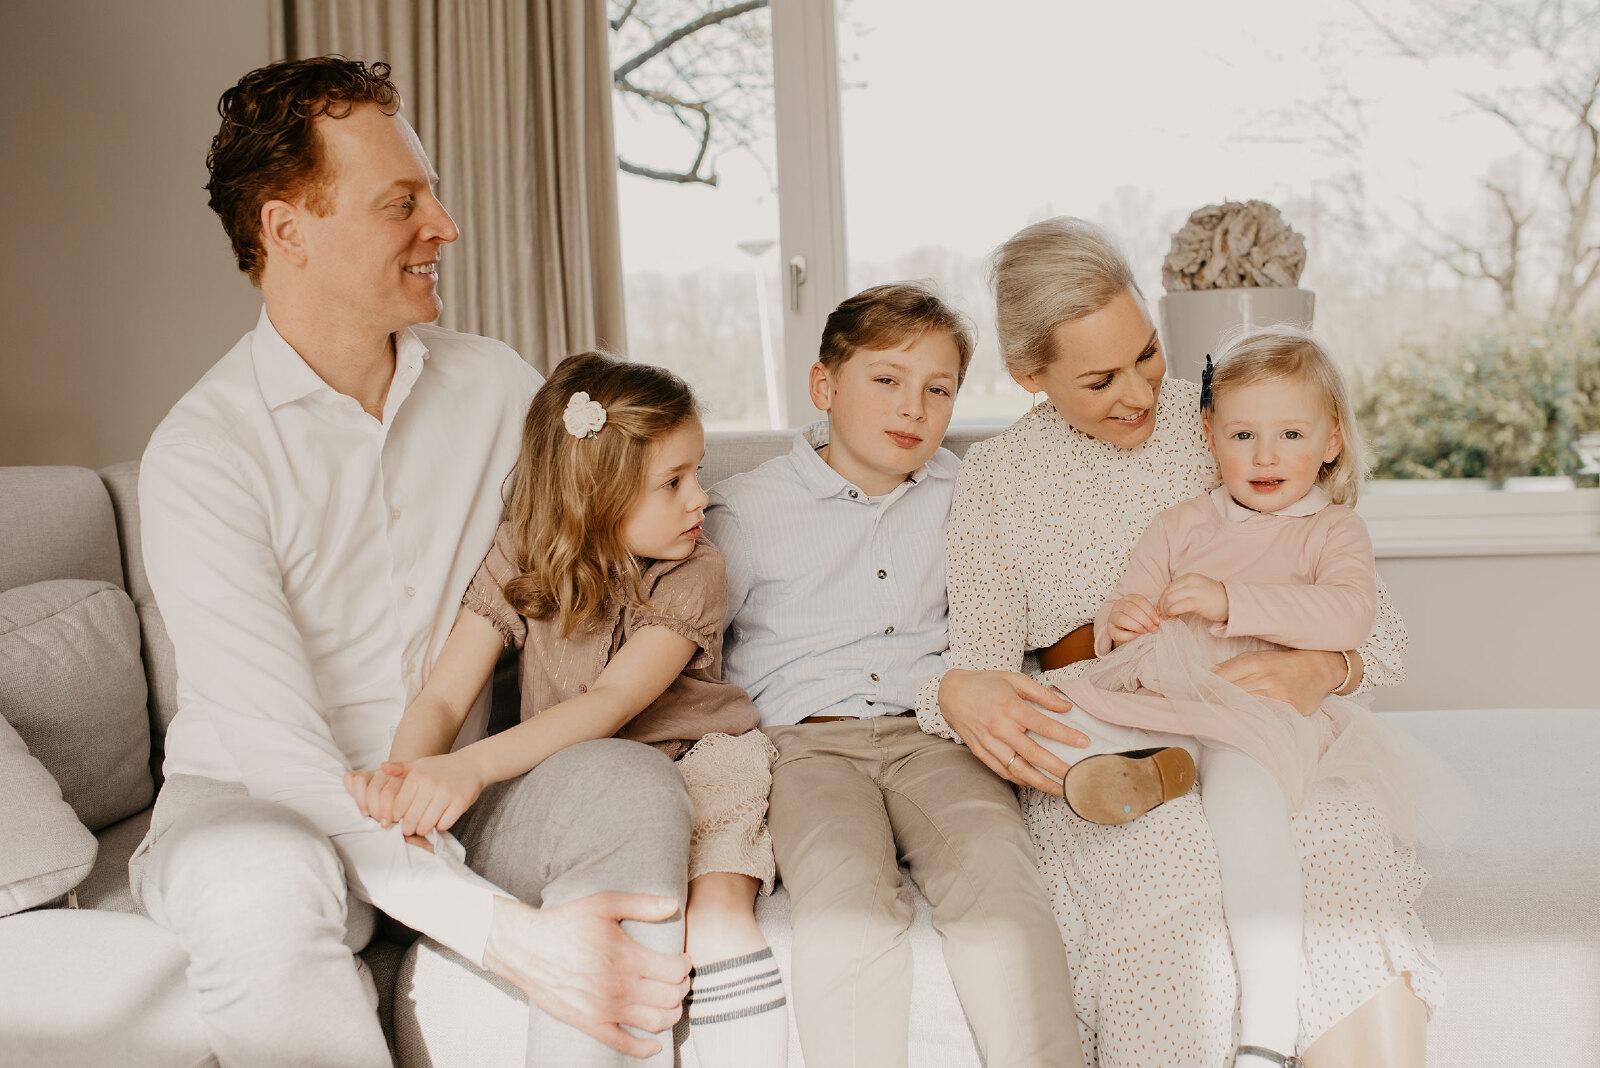 familie fotoshoot thuis op de bank